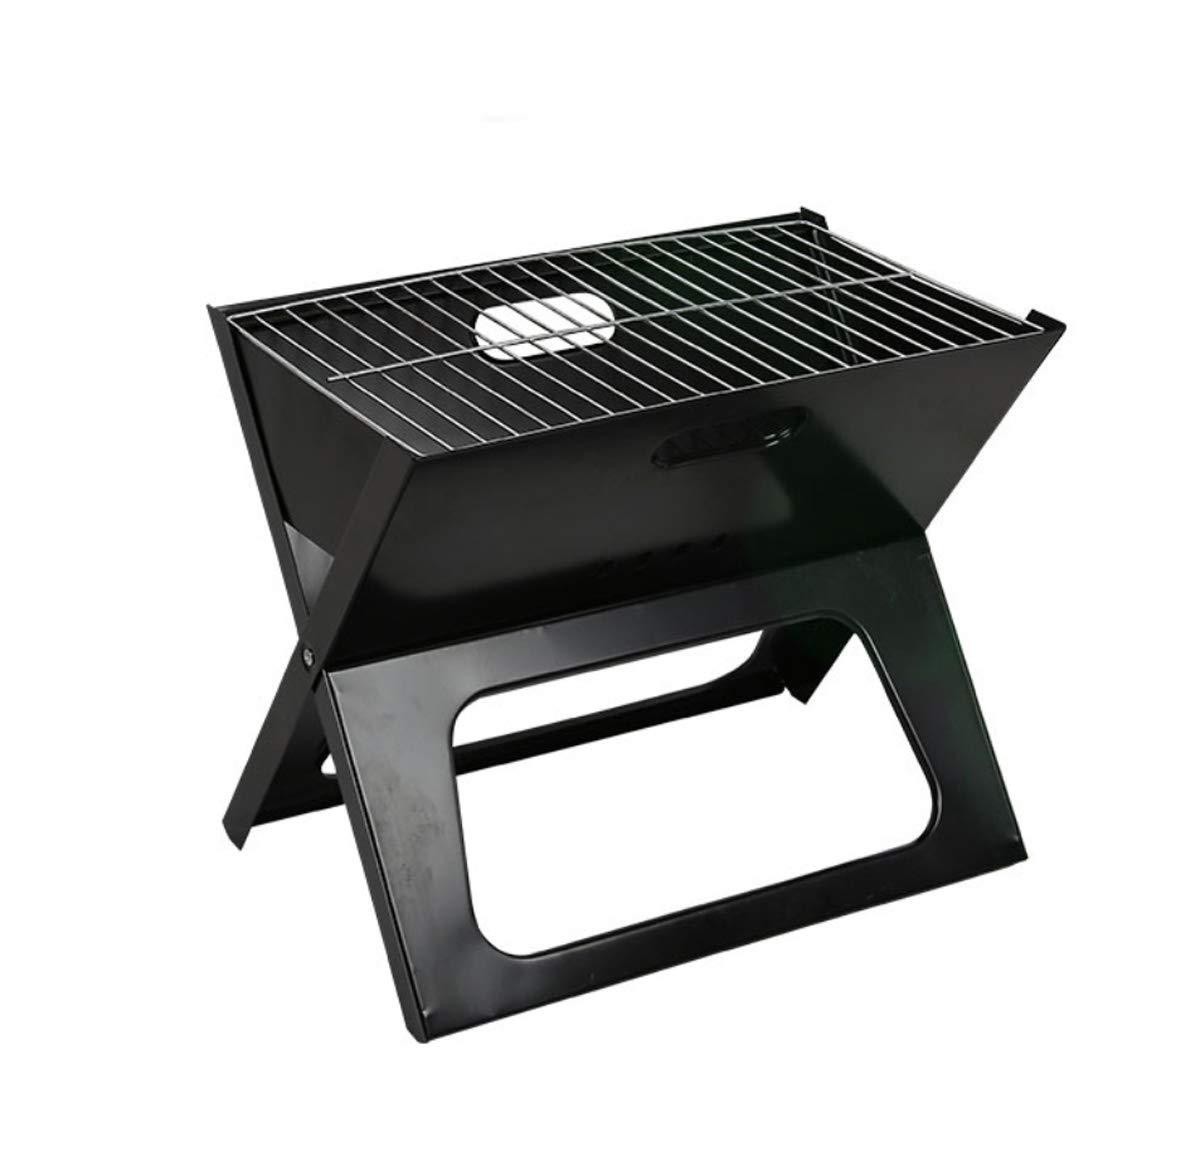 ZXMXY BBQ Grill Klapp Outdoor X-Förmige Klapp Grill Grill Bequeme Grill-Notebook-Stil Grill 44  29  36,5 (cm) dc3fe8